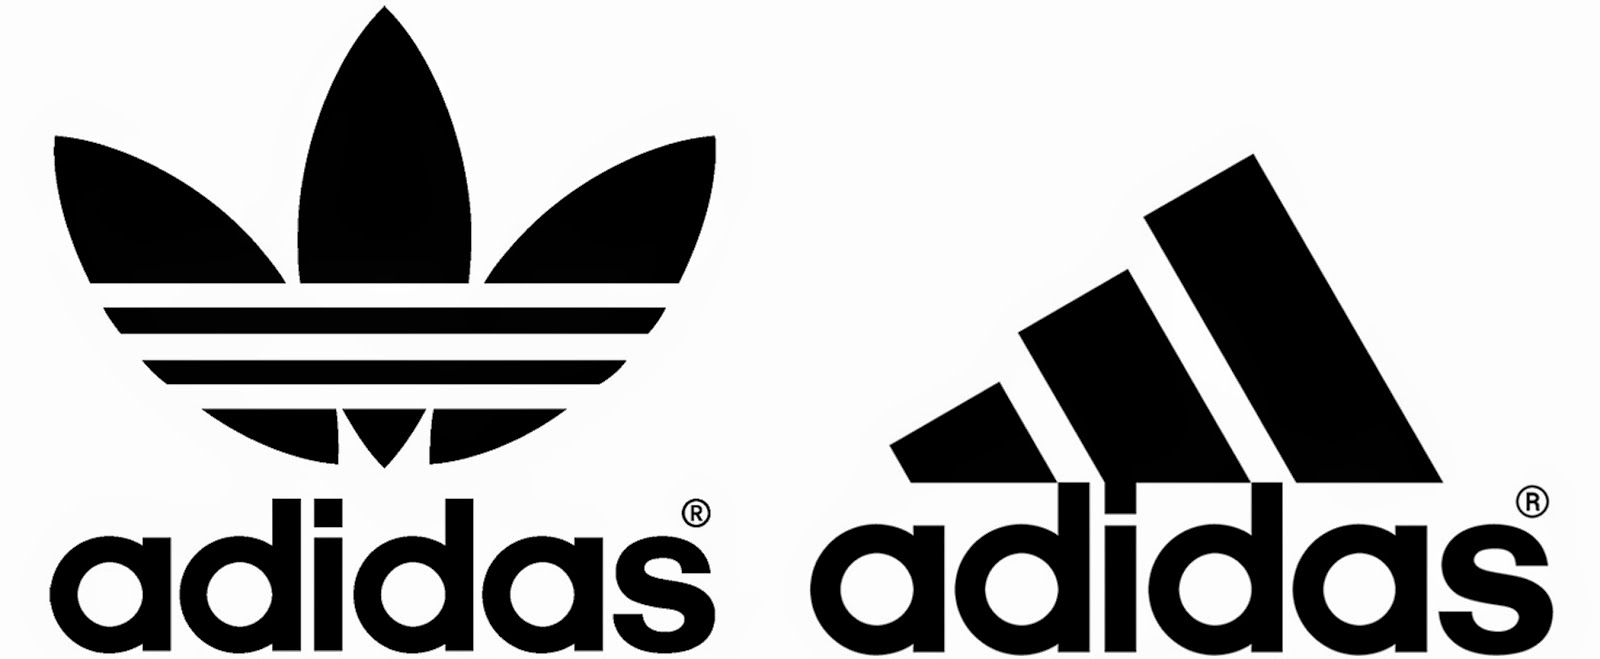 graphics and folk assam logo2